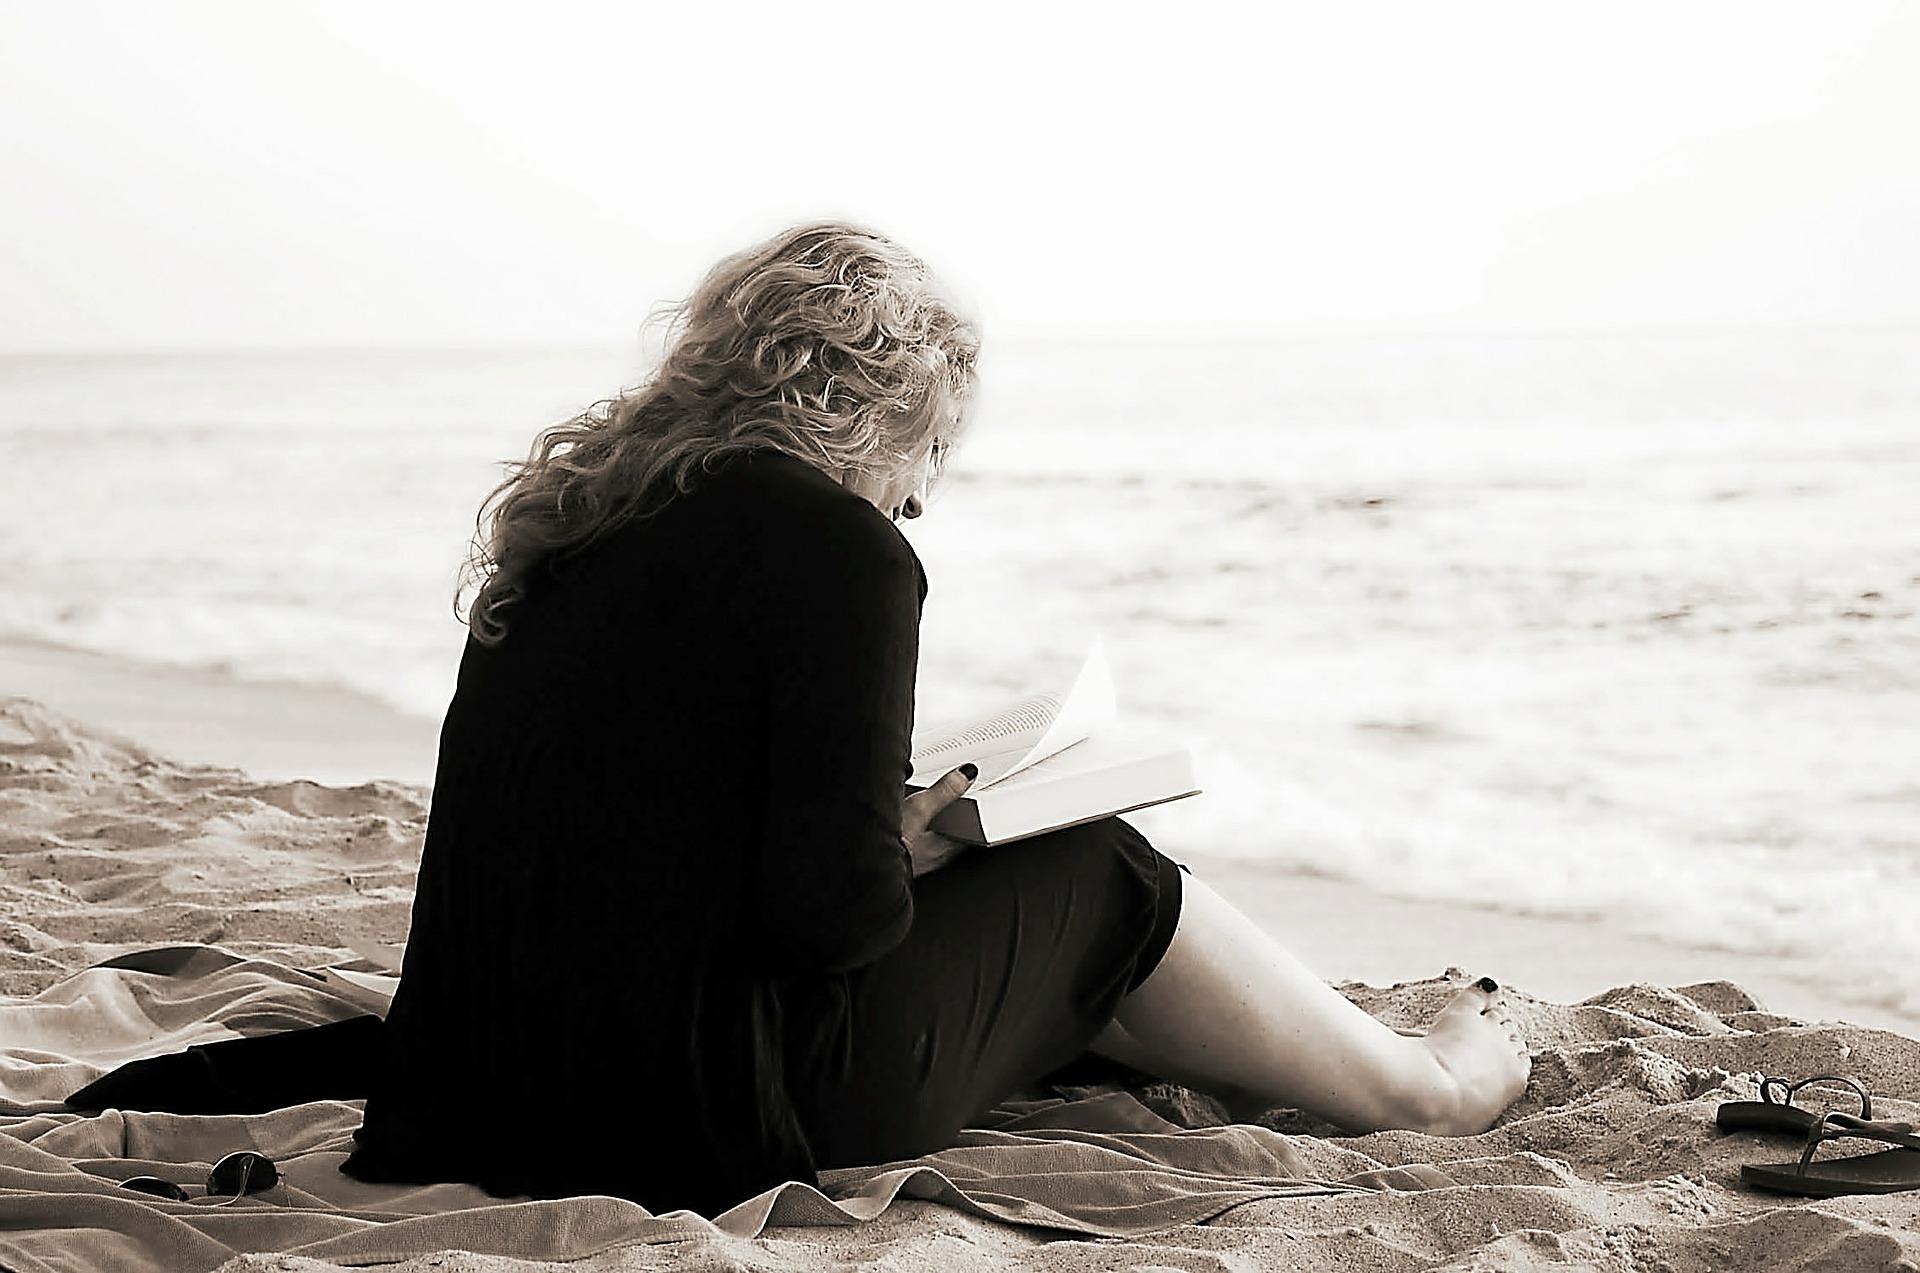 cand esti singur - sfatulparintilor.ro - pixabay_com - read-369040_1920